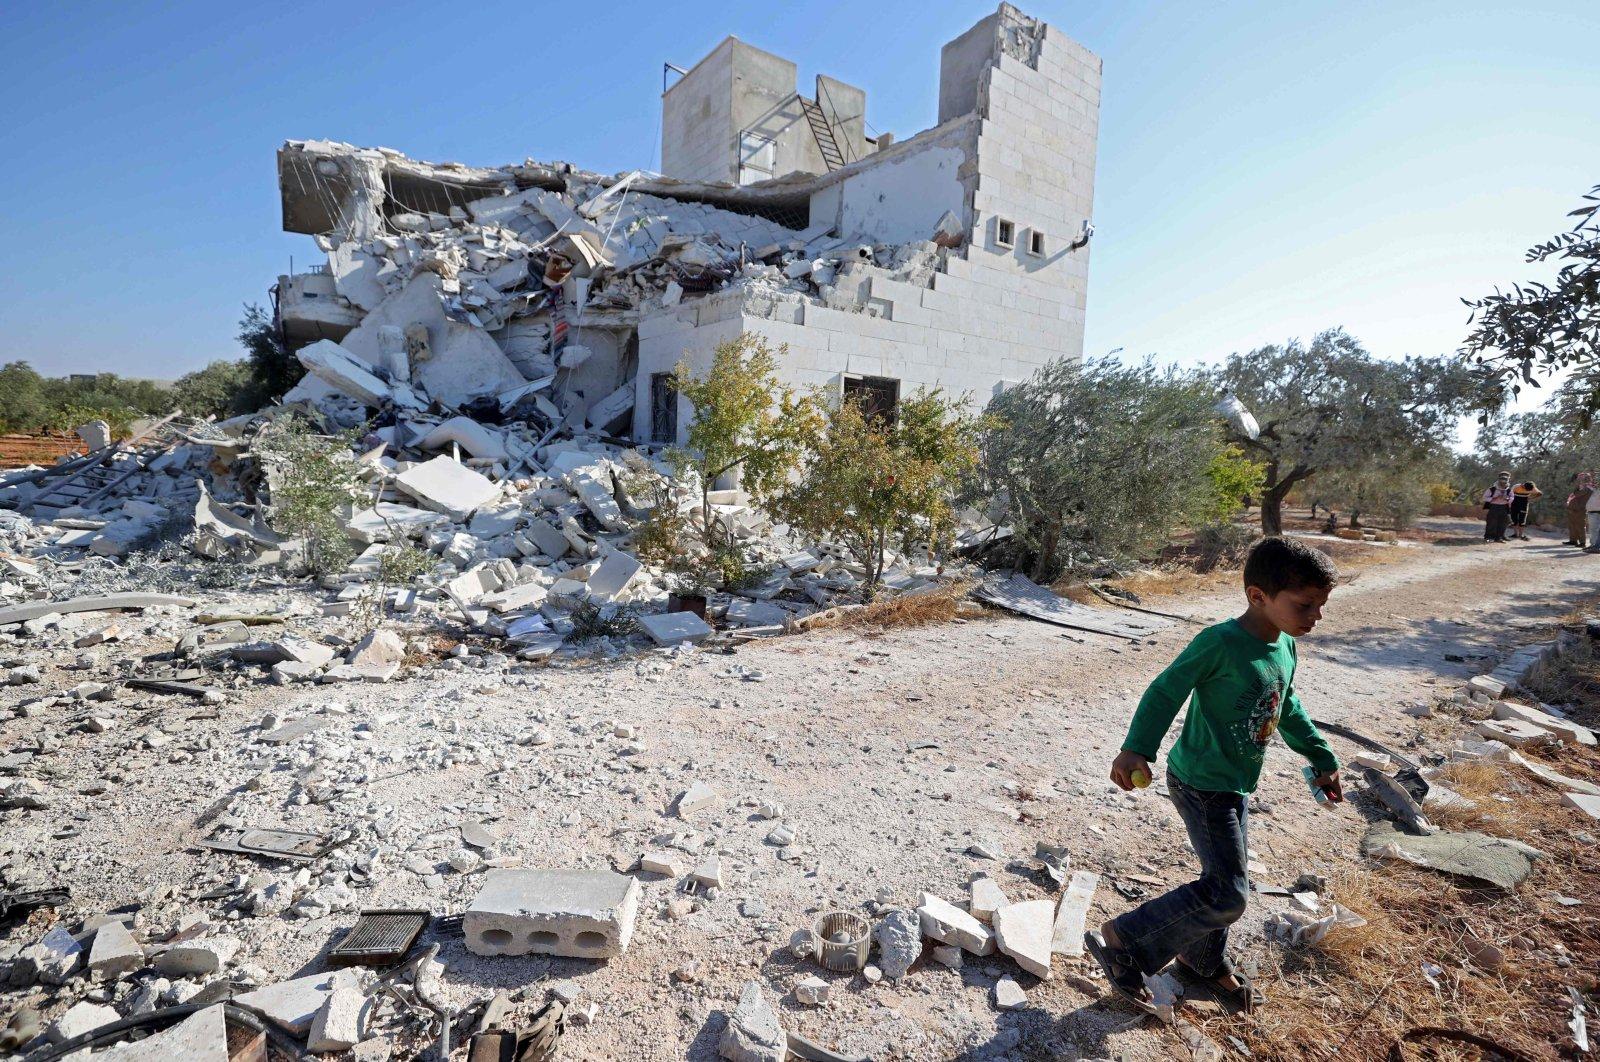 Destruction following the Syrian regime shelling in Idlib, northwestern Syria, Sept. 8, 2021. (AFP Photo)